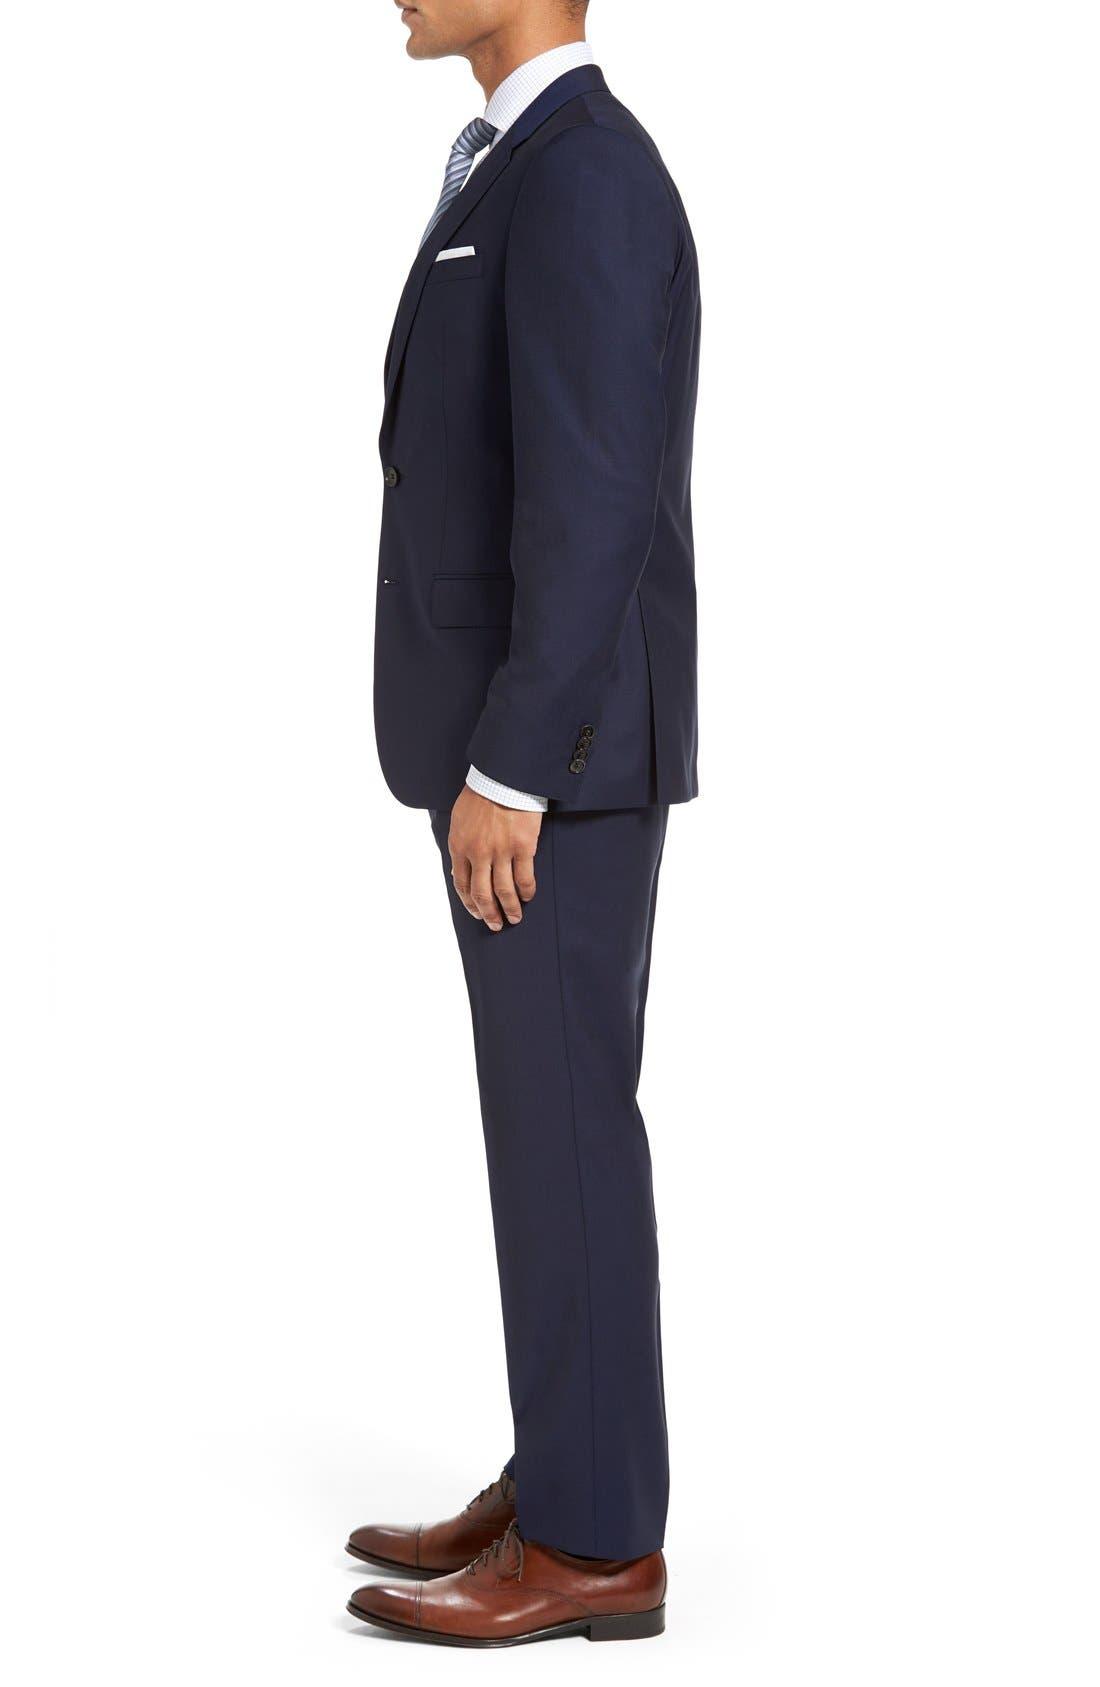 BOSS, Huge/Genius Trim Fit Navy Wool Suit, Alternate thumbnail 3, color, 410